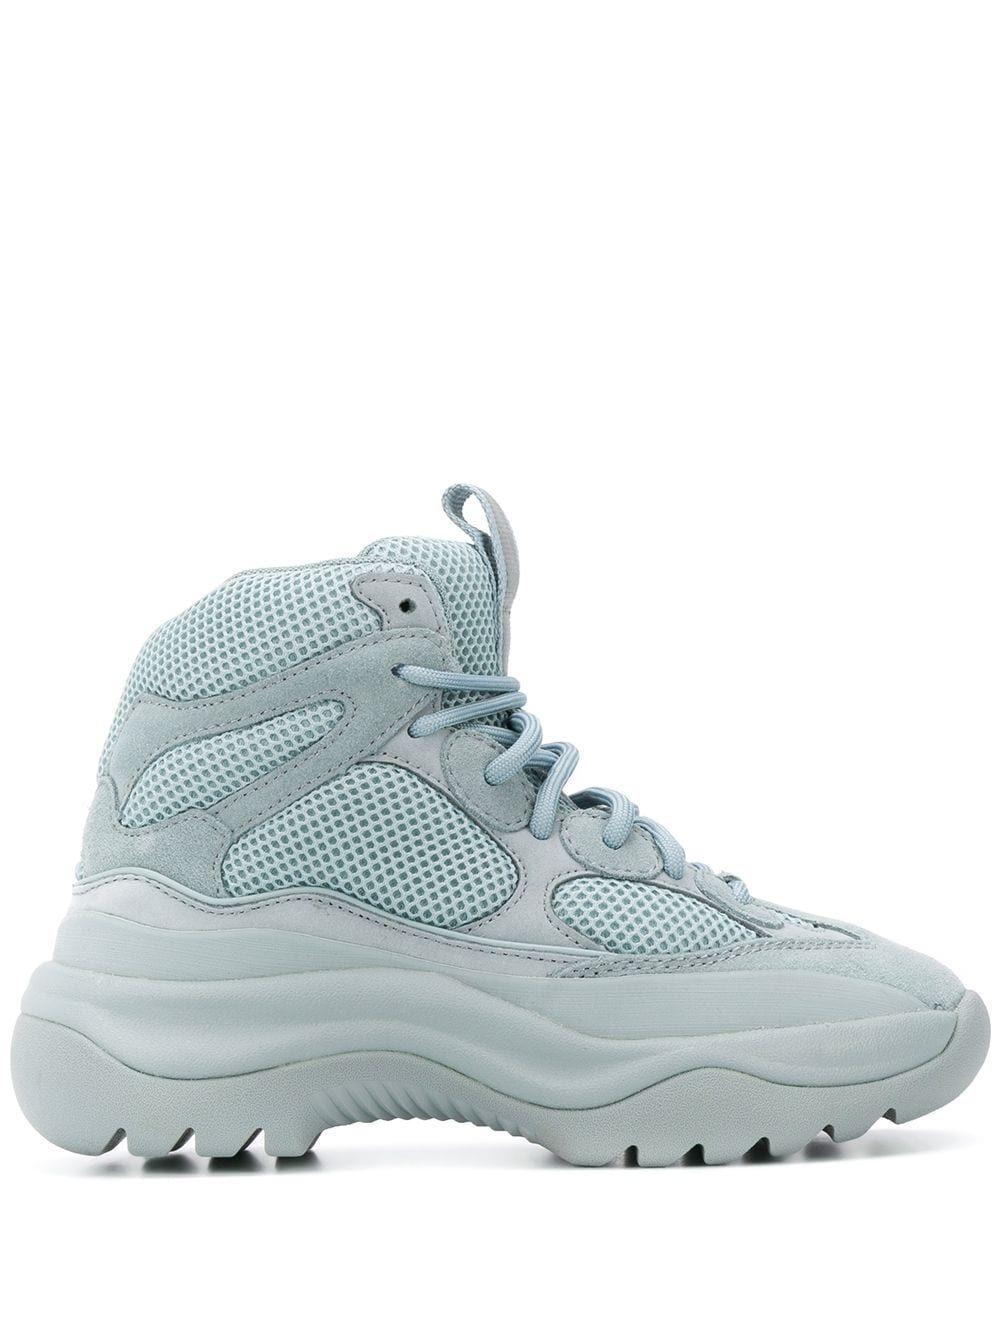 Yeezy Season 7 Desert Boot Sneakers In